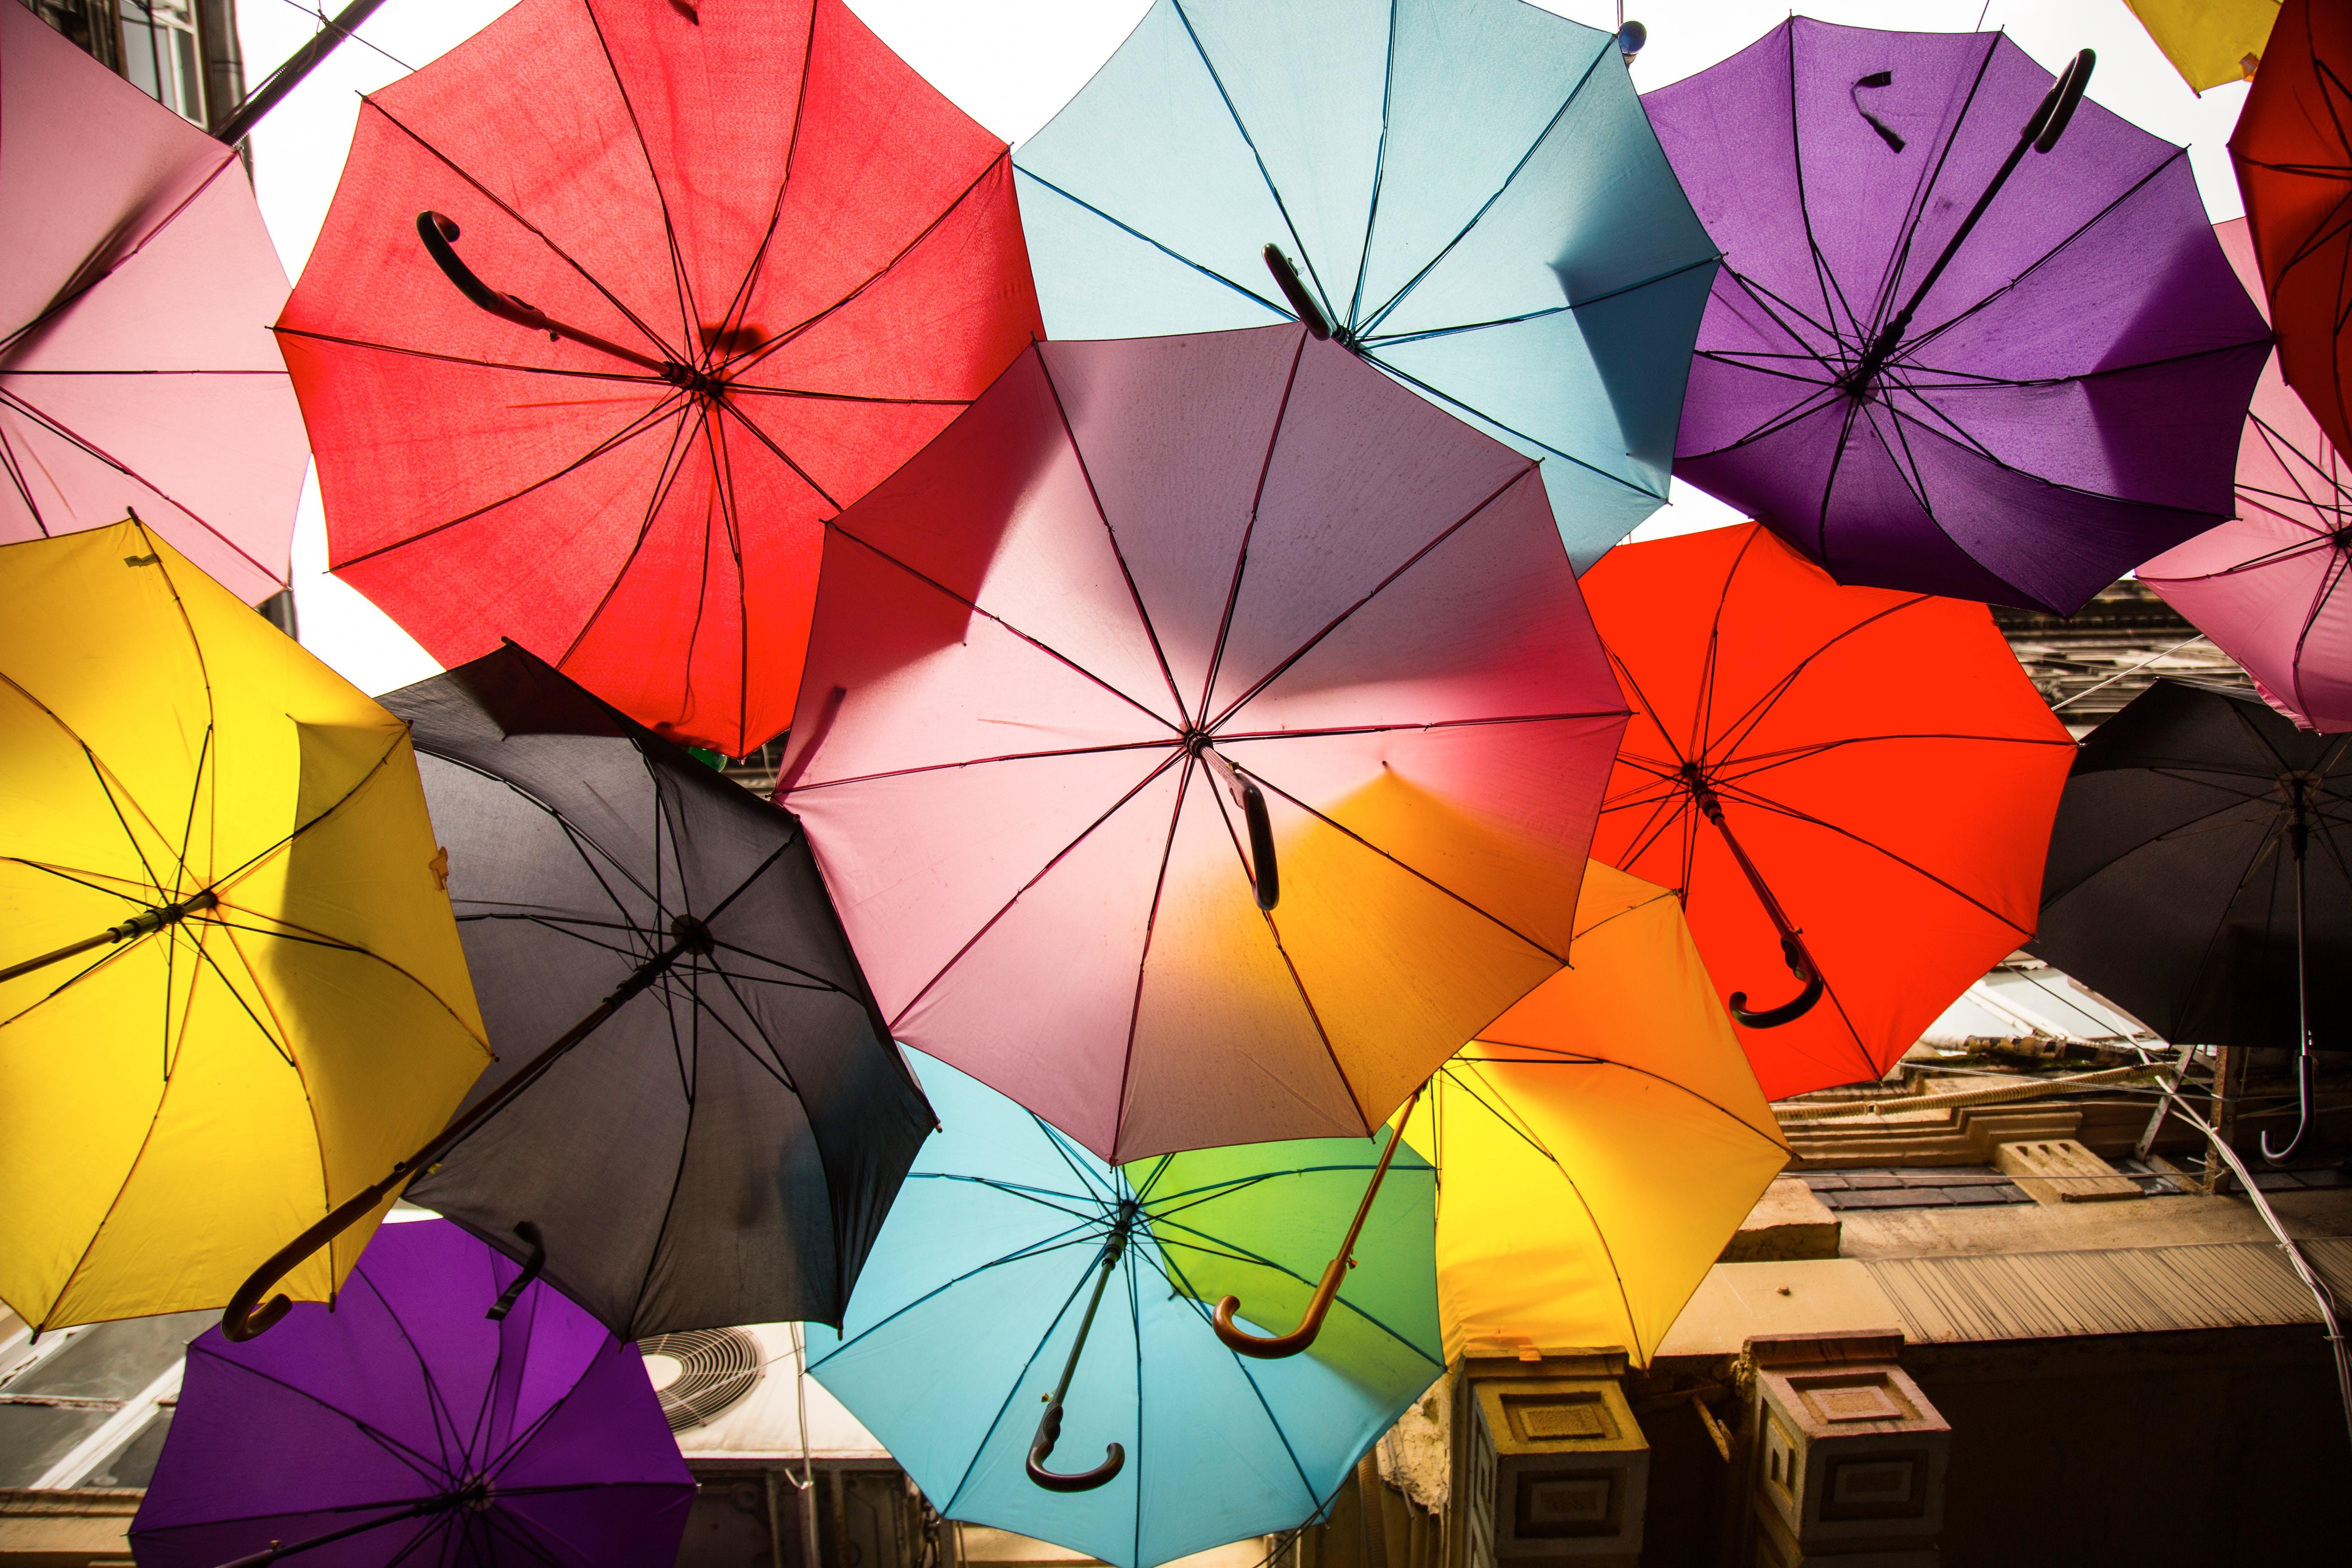 Assorted-color Umbrellas